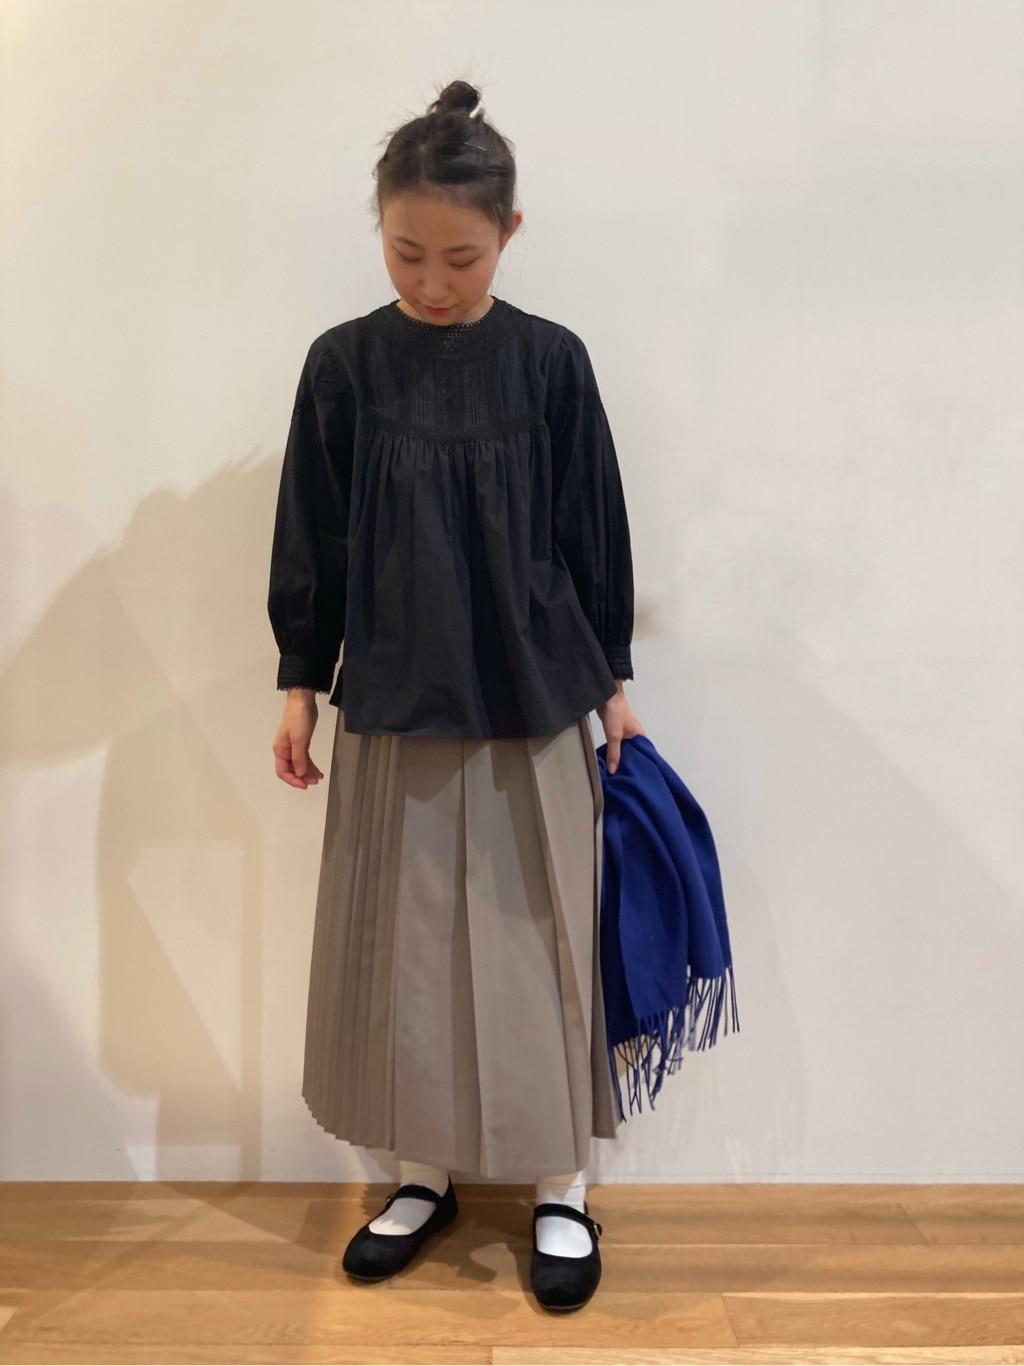 bulle de savon KITTE丸の内 身長:159cm 2020.11.18